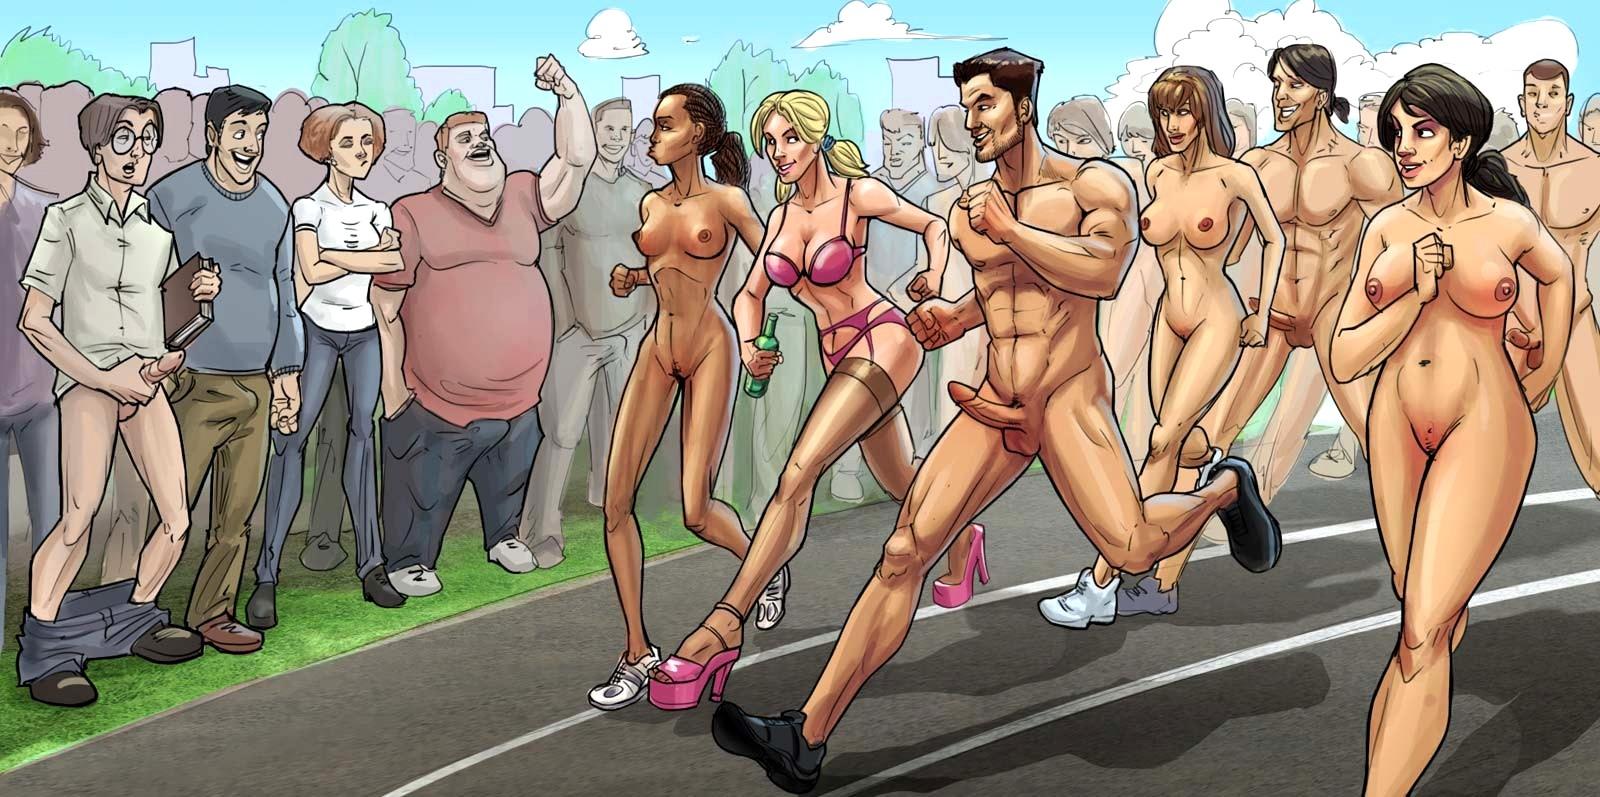 Candy's xxx games cartoons